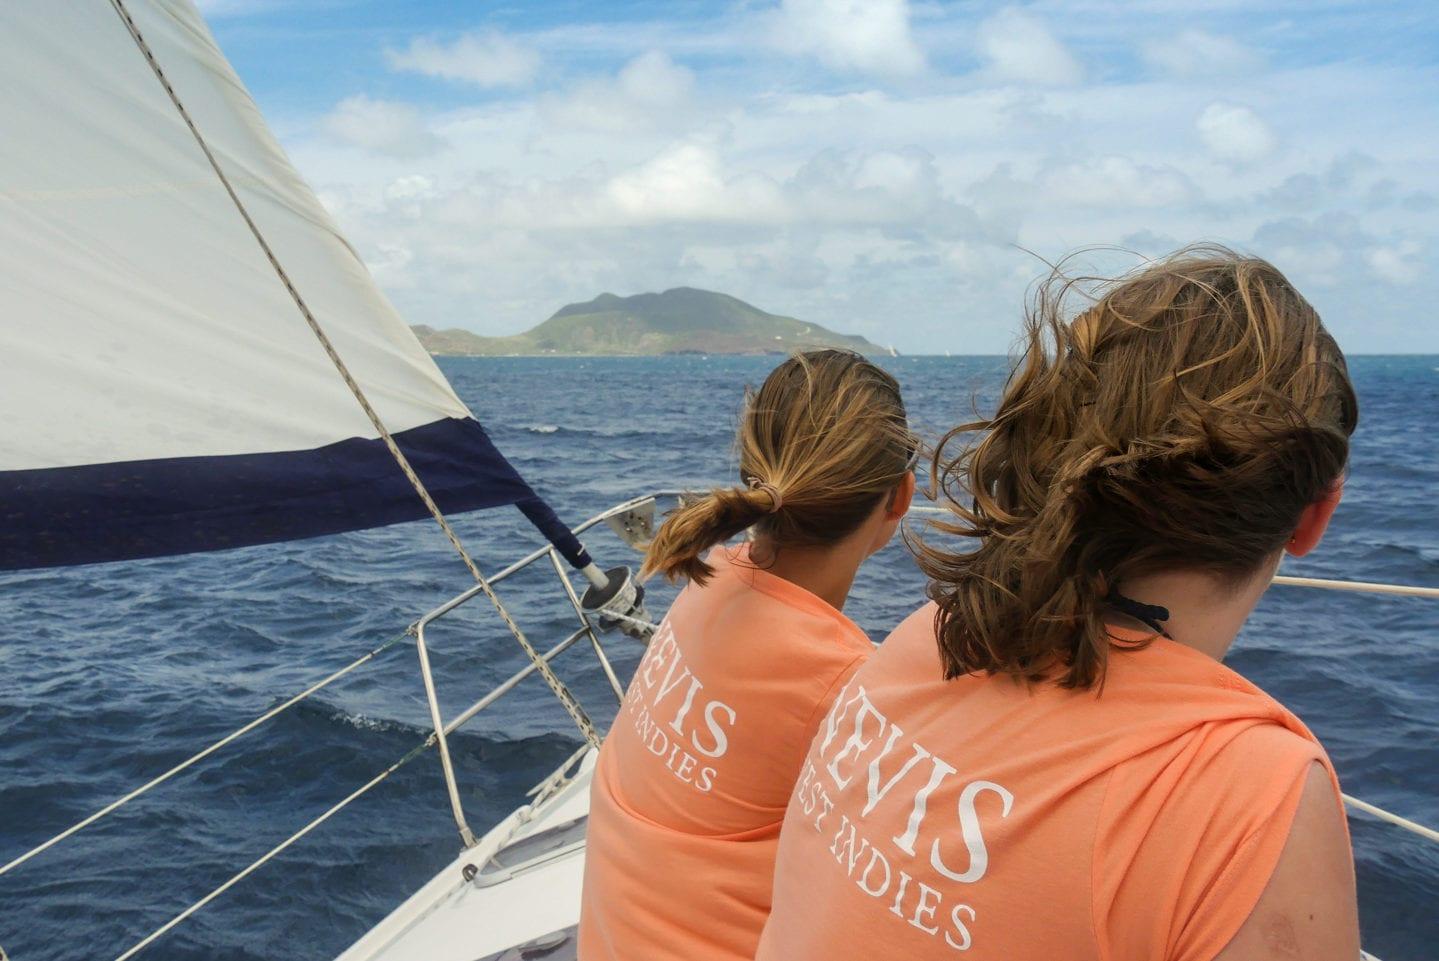 caribbean-sailing-regatta-booby-island-cup-nevis